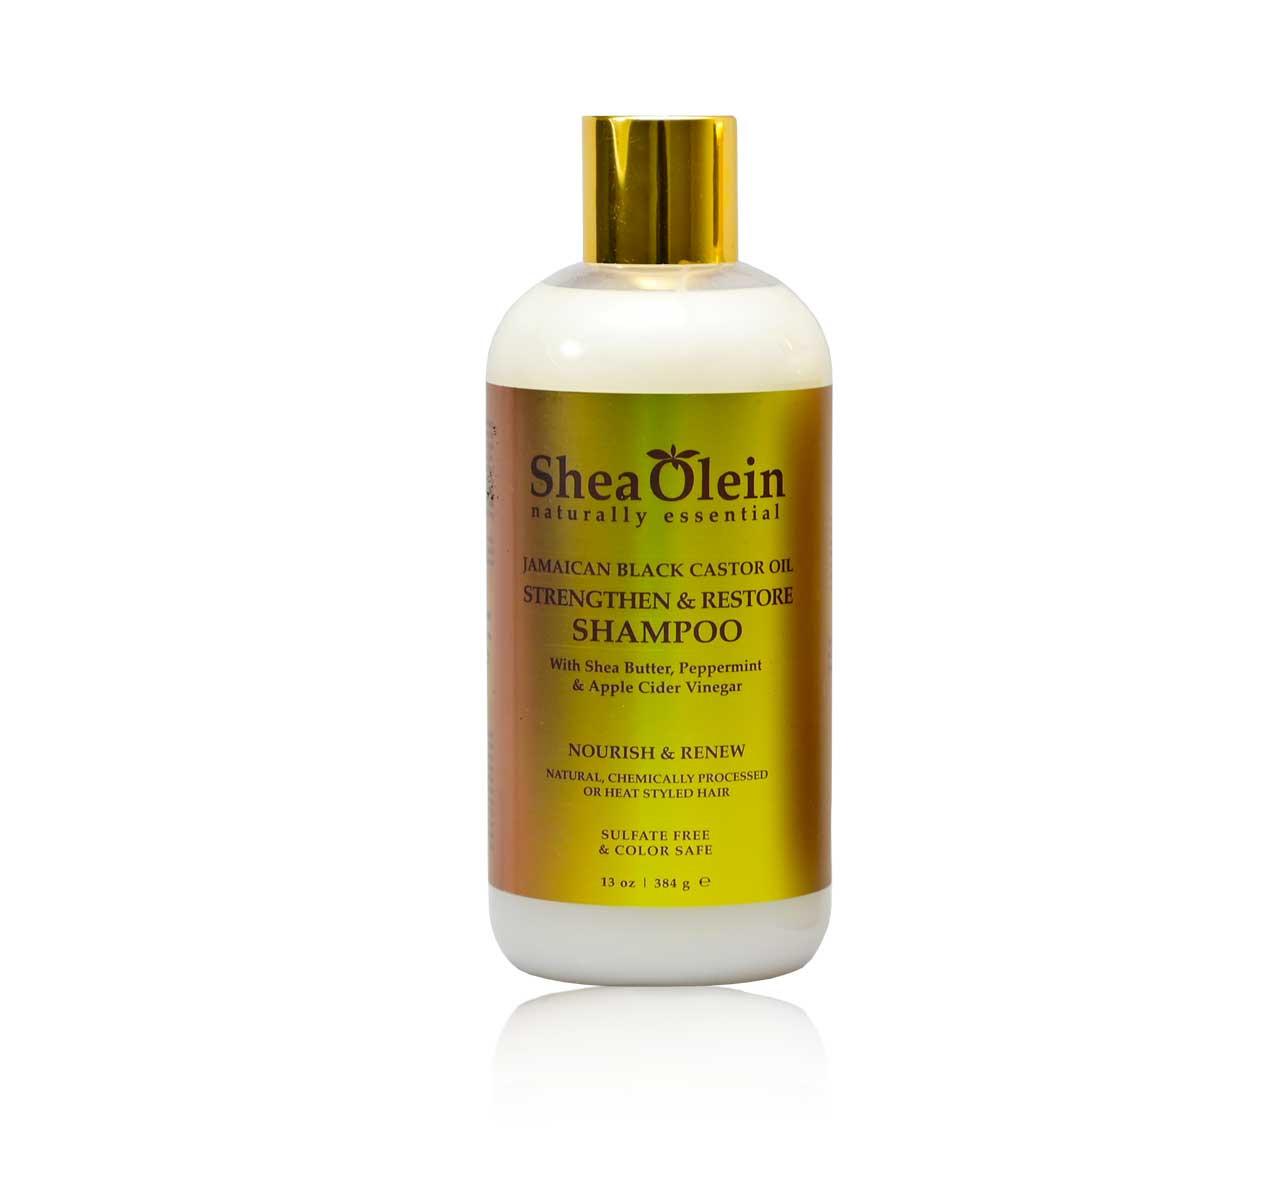 SheaOlein Jamaican Black Castor Oil Shampoo - 13 fl oz